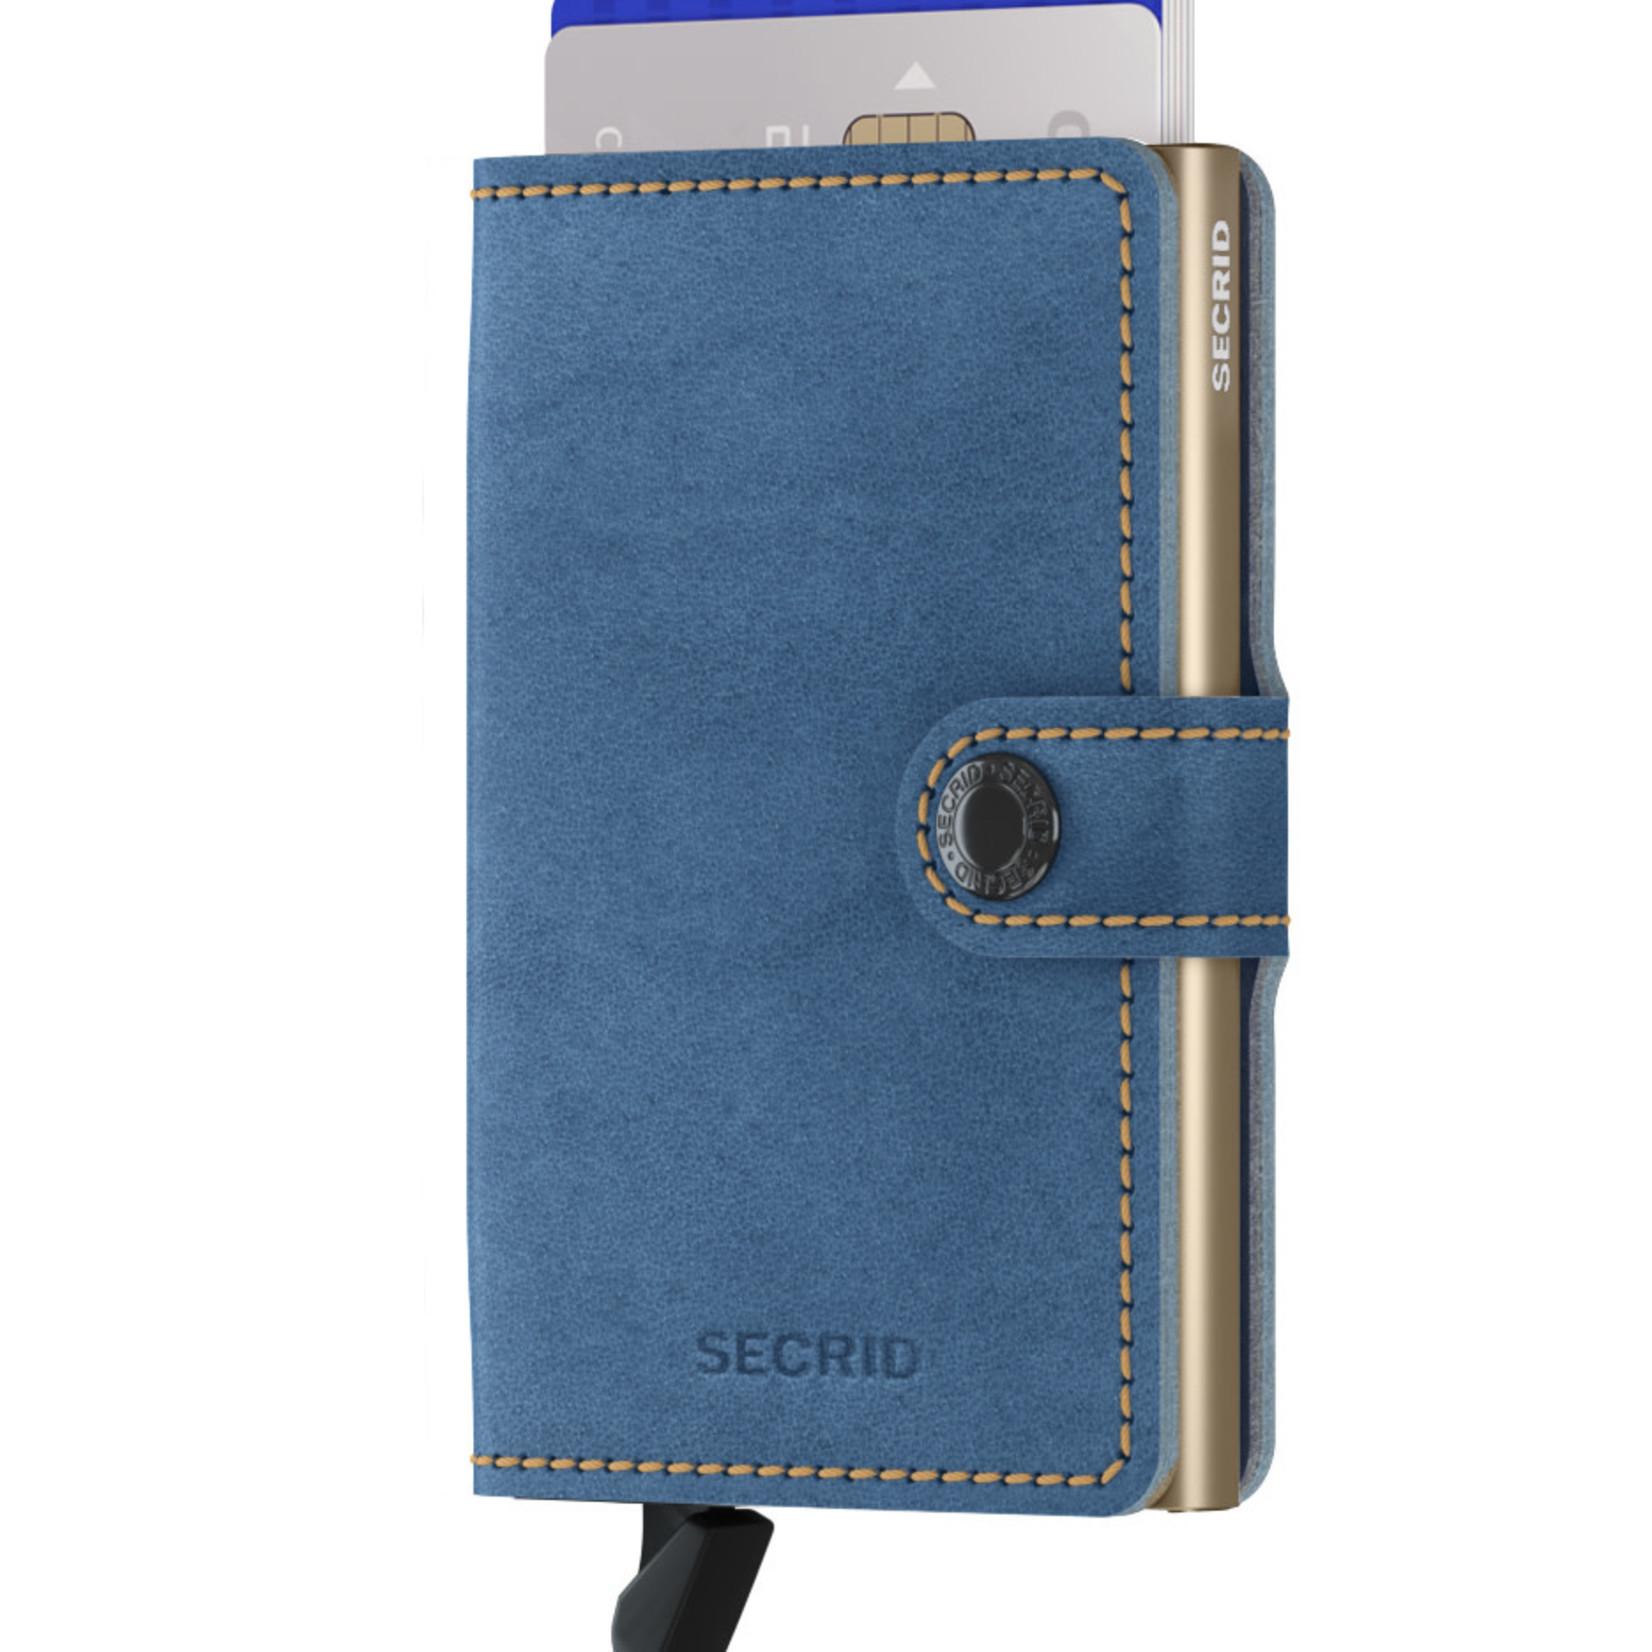 SECRID Secrid Mini Indigo 3 Sand